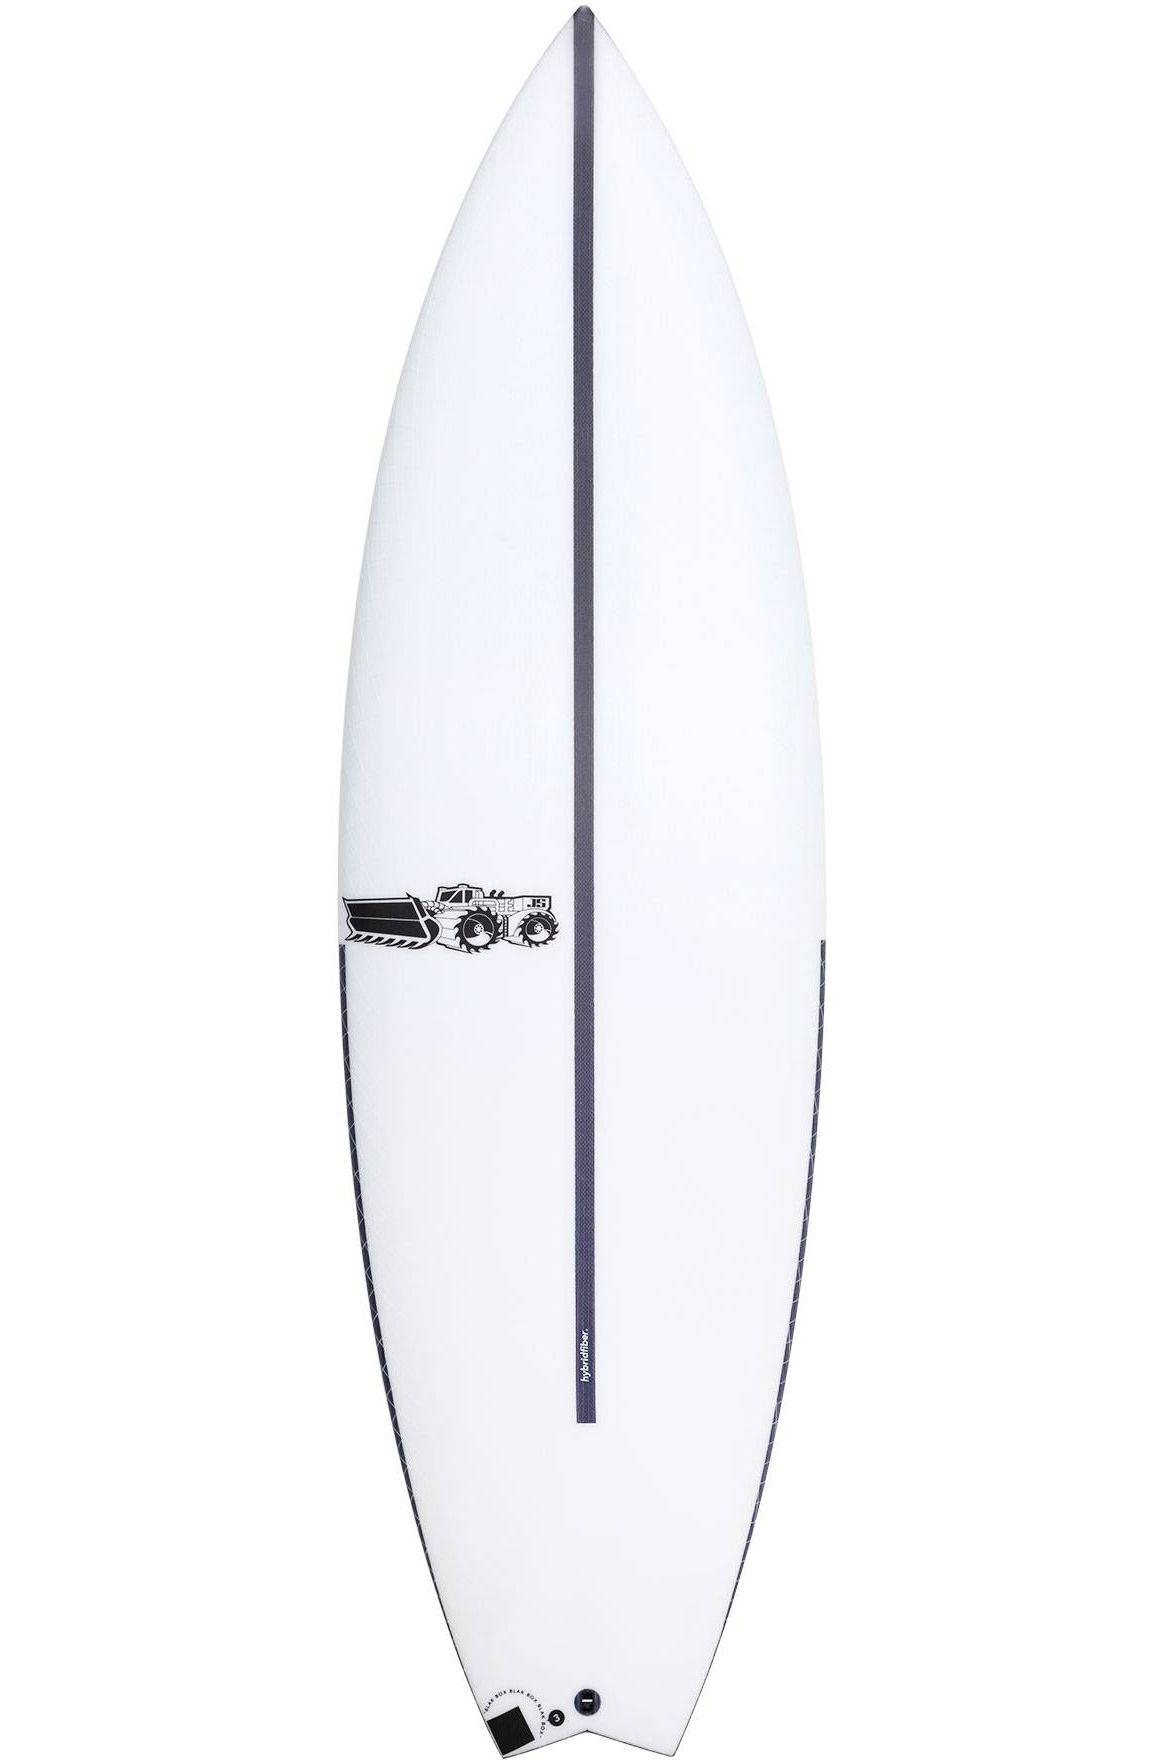 Prancha Surf JS 5'7 BLAK BOX 3 HYFI Swallow Tail - Color FCS II Multisystem 5ft7